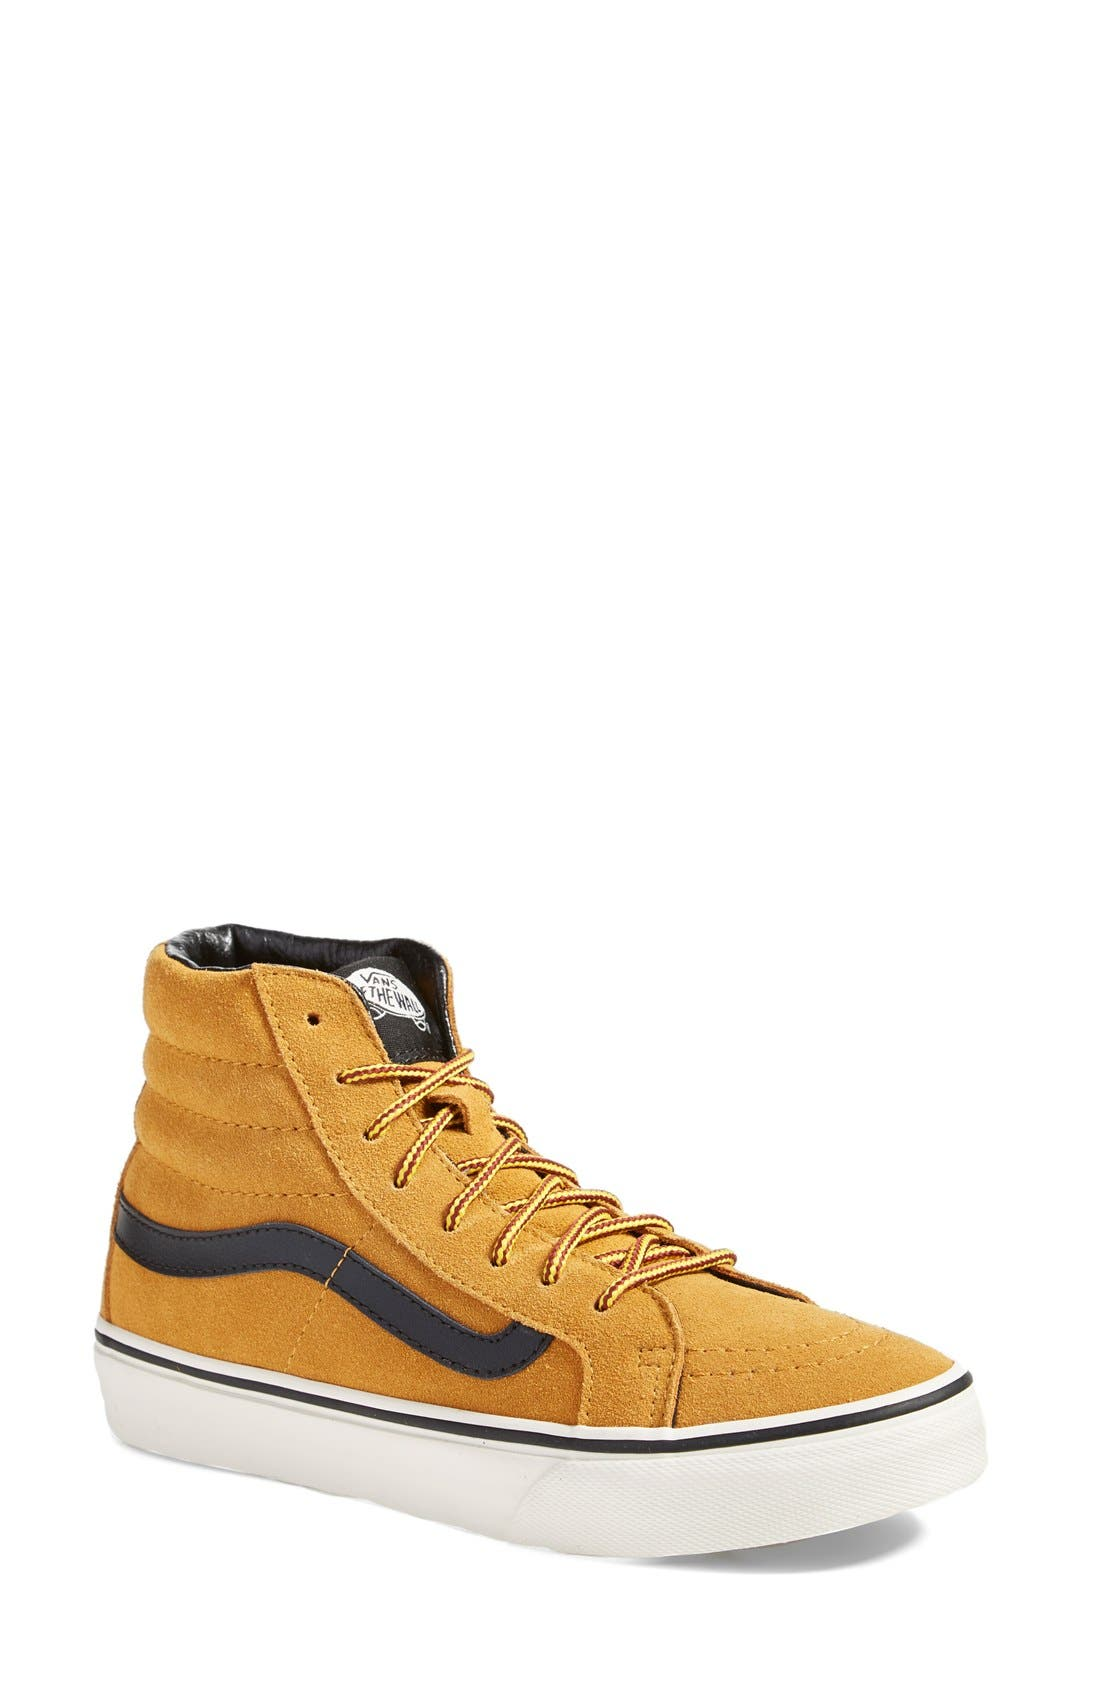 Main Image - Vans 'Sk8-Hi Slim' Suede Sneaker (Women)